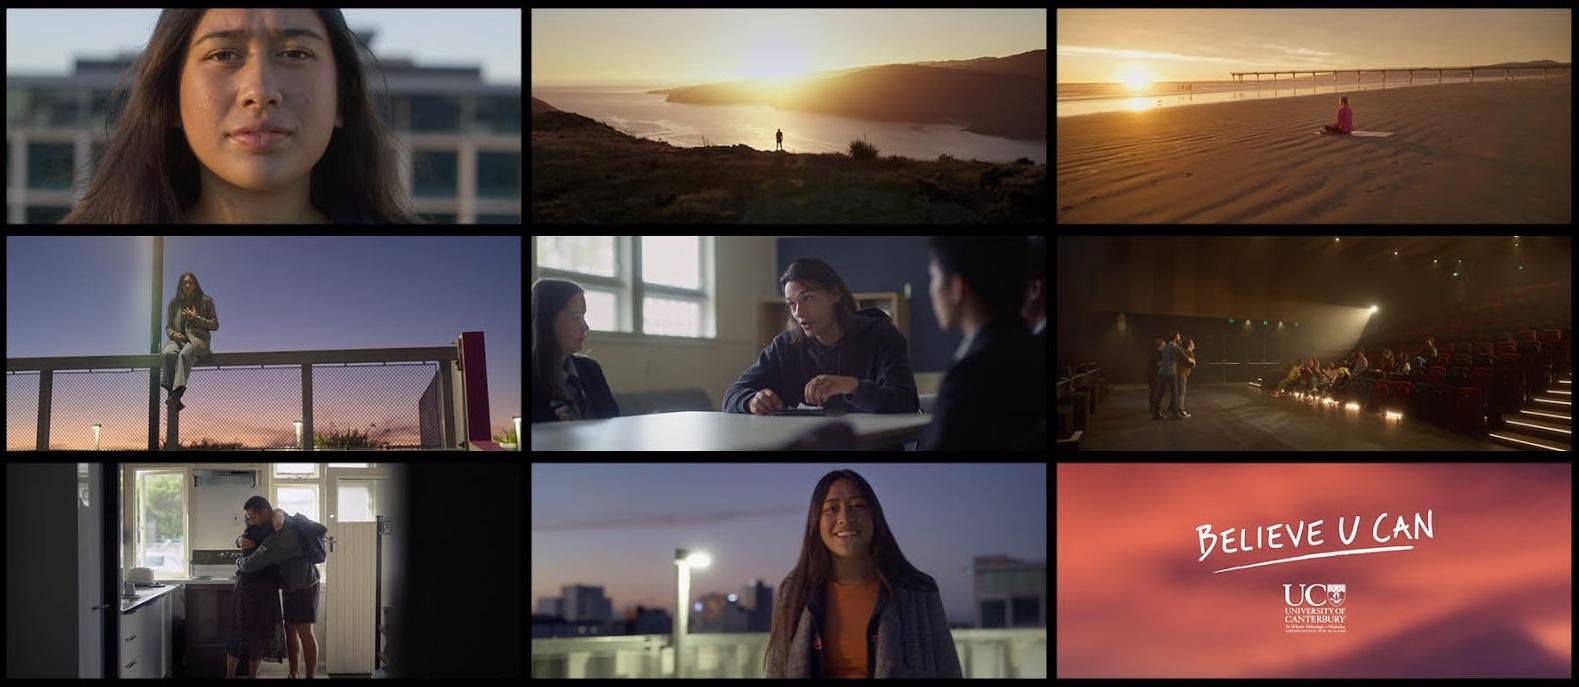 University of Canterbury inspires self-belief in 'Believe U Can' film via Strategy Christchurch